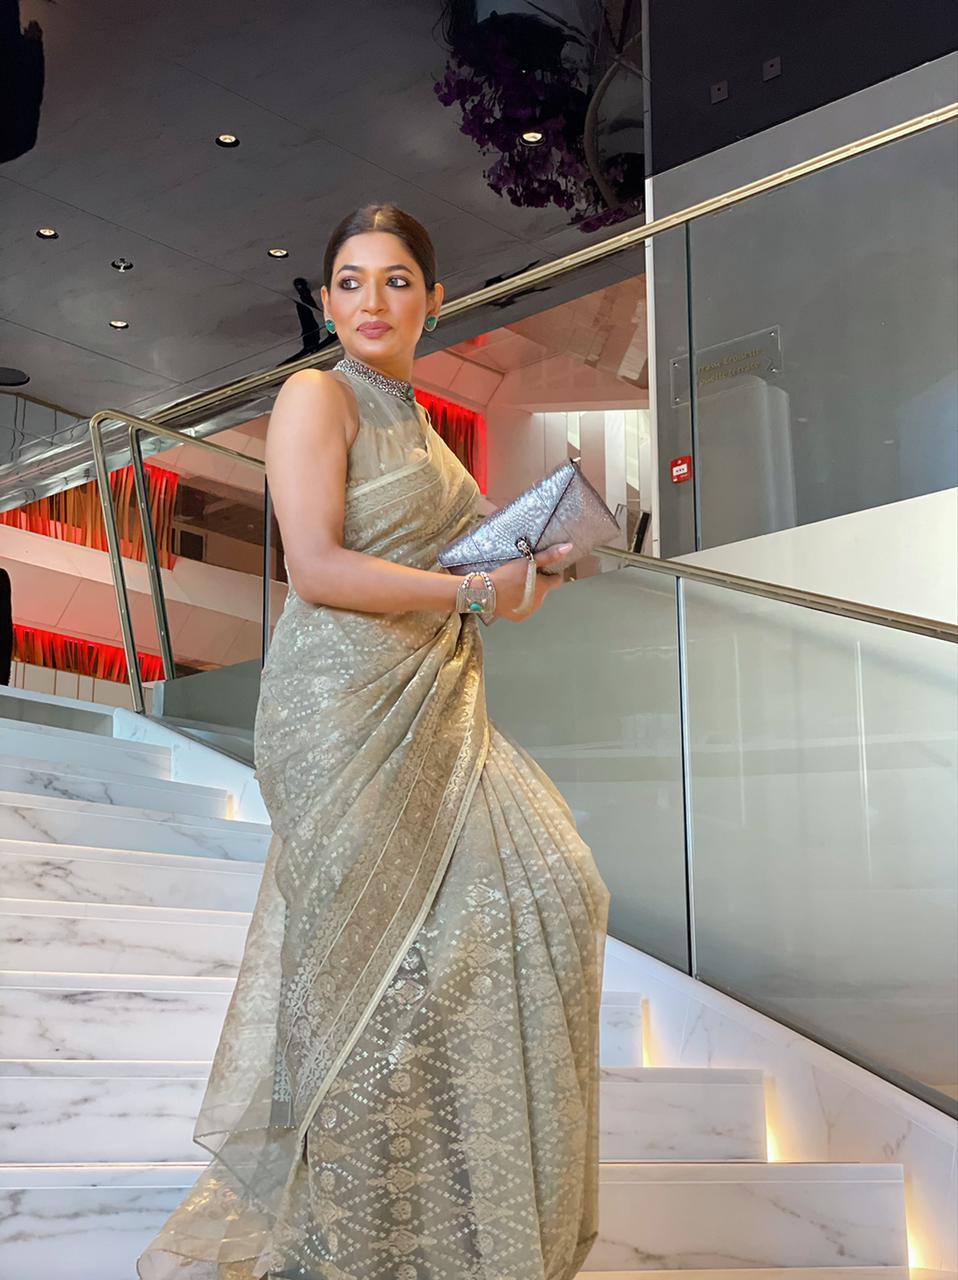 Badhon star of 'Rehana Maryam Noor' wears Aarong jamdani at the 74th Cannes Film Festival